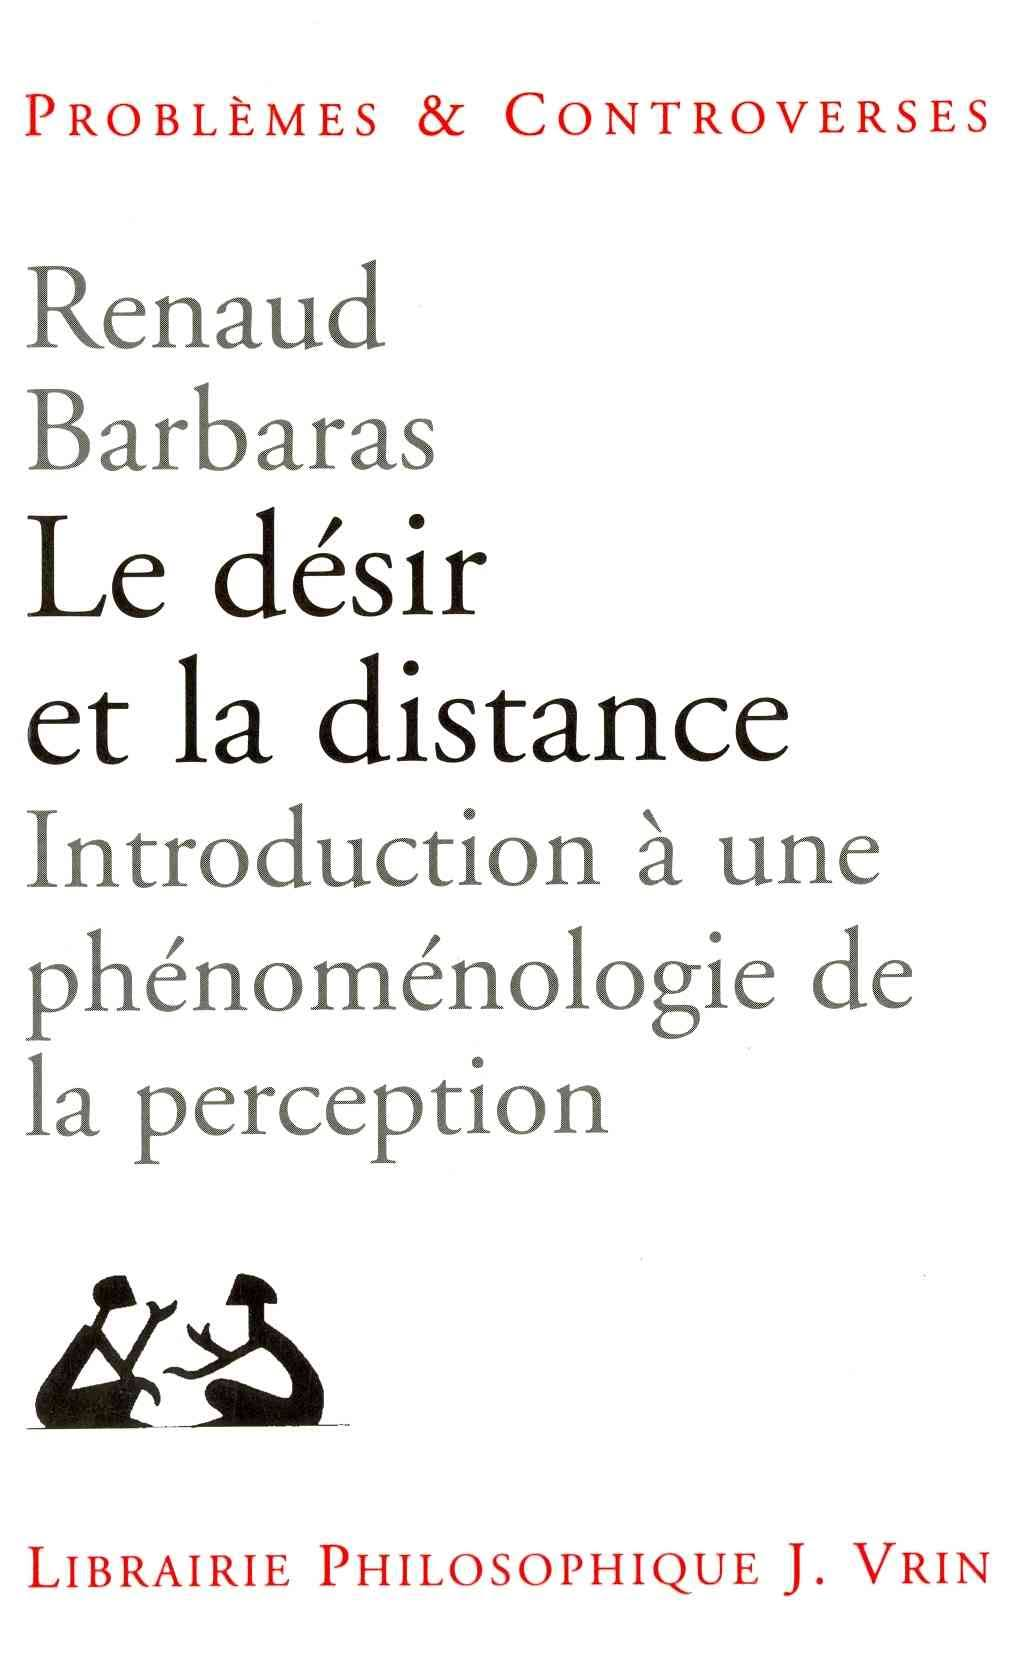 barbaras_le_desir_et_la_distance.jpg